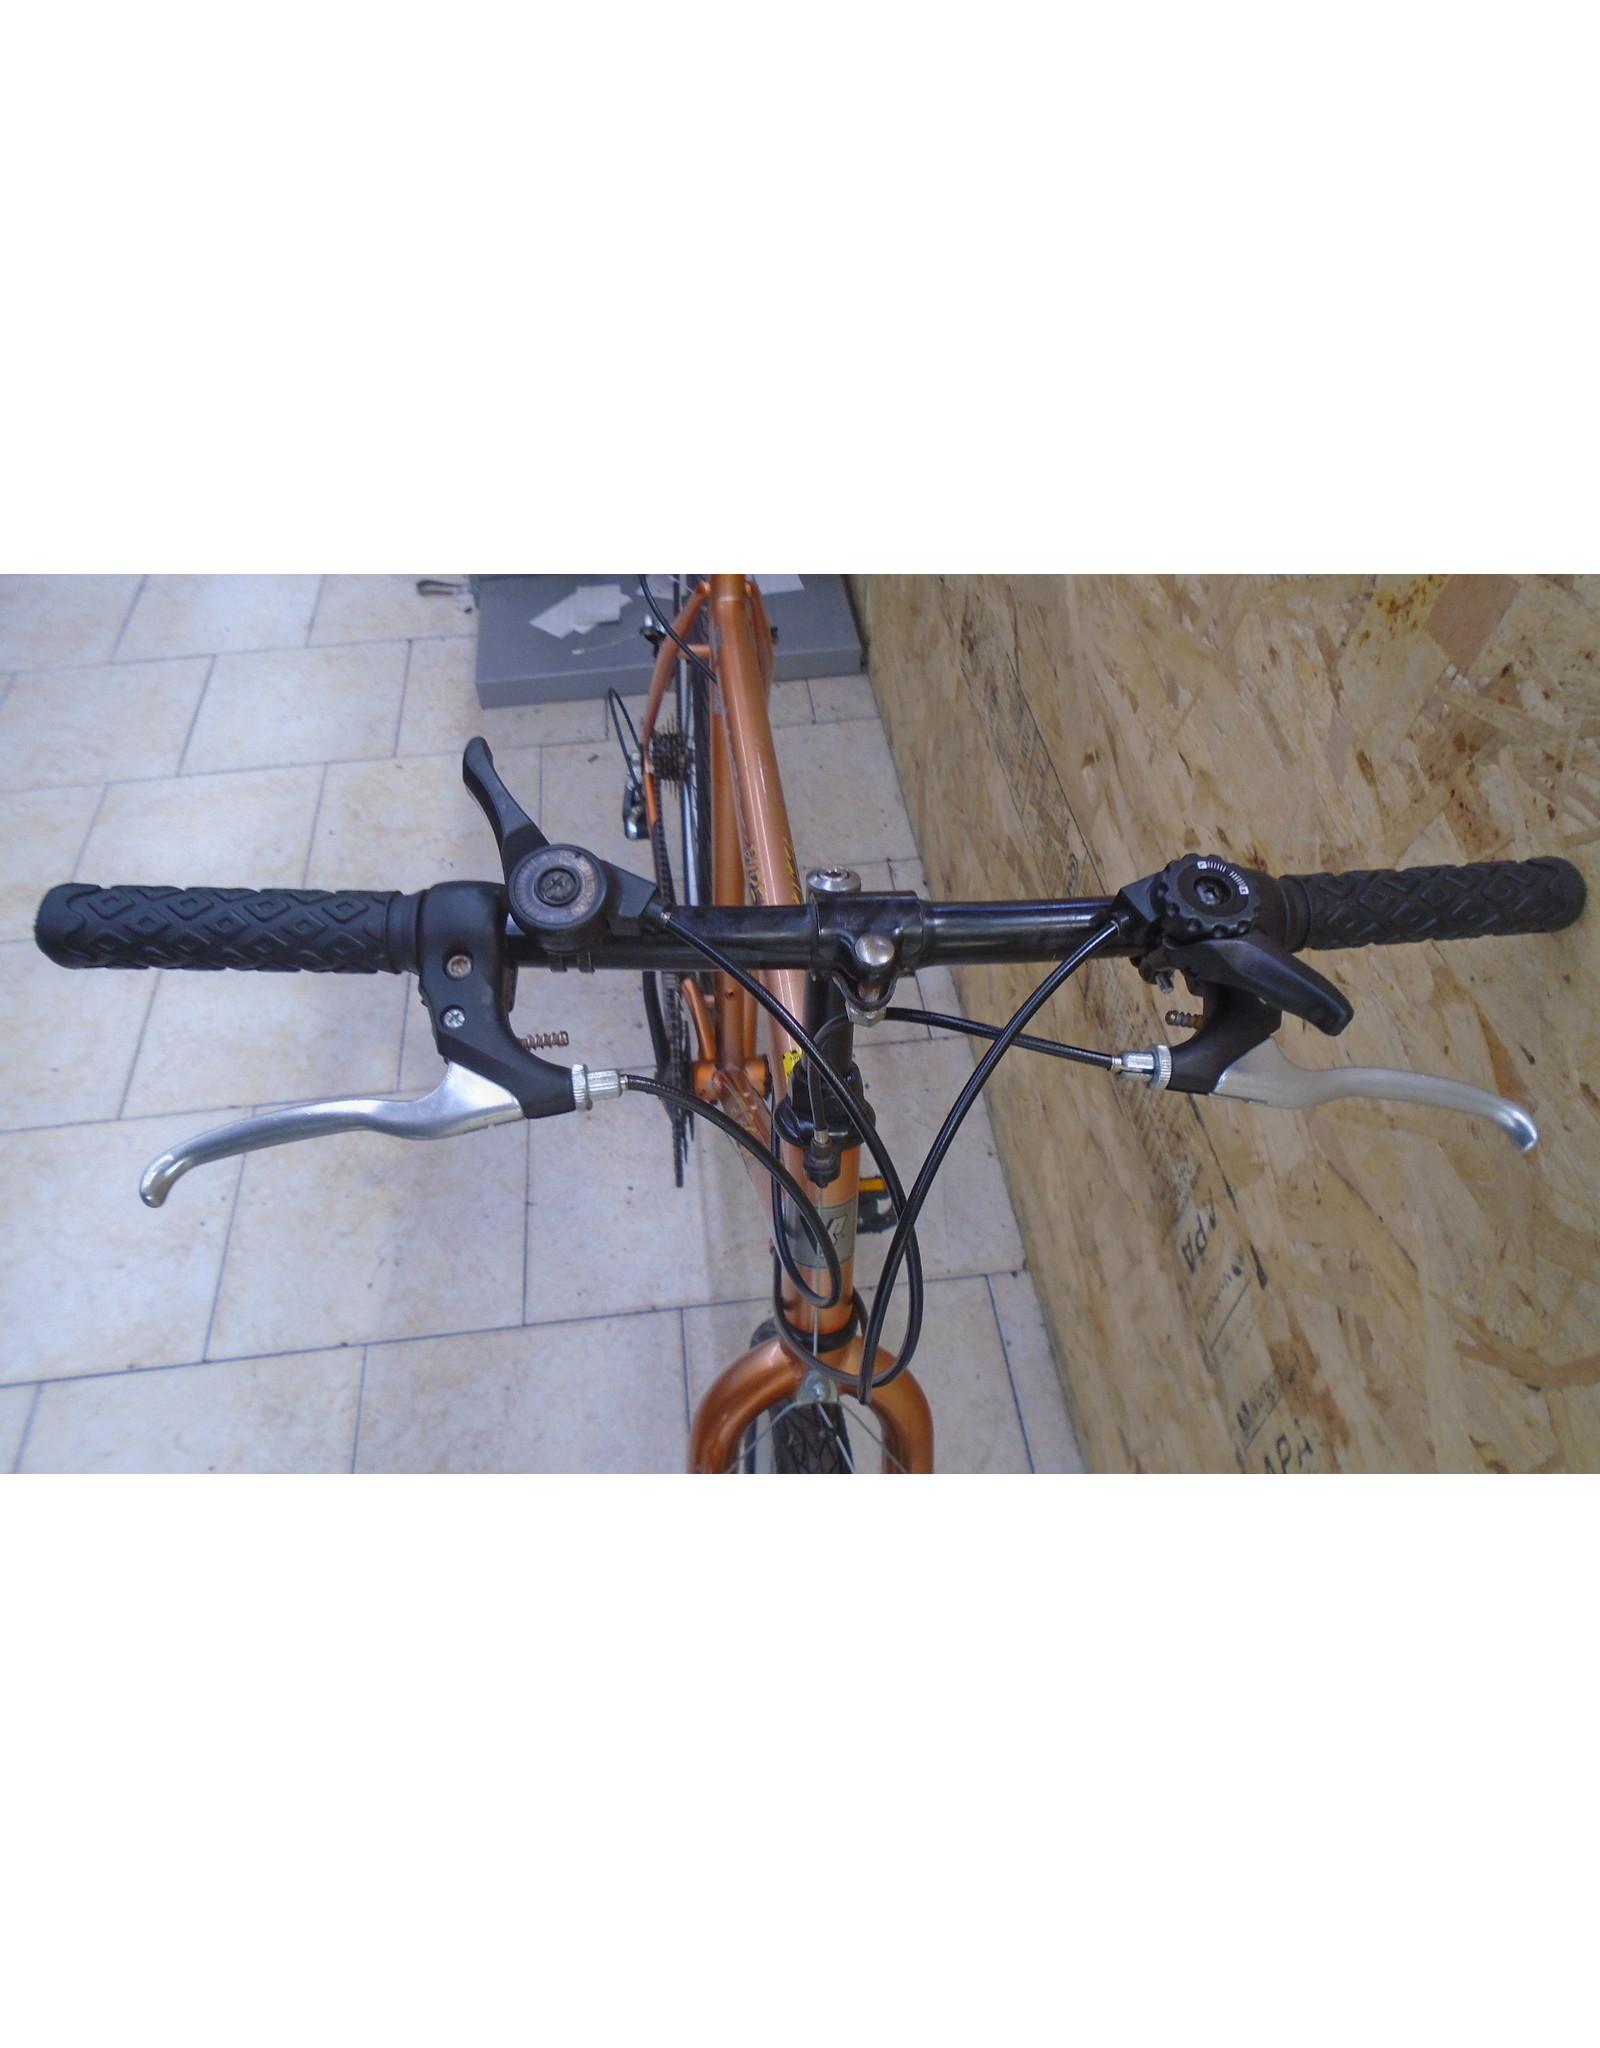 "Vélo usagé de ville Vélo Sport 20"" - 9777"